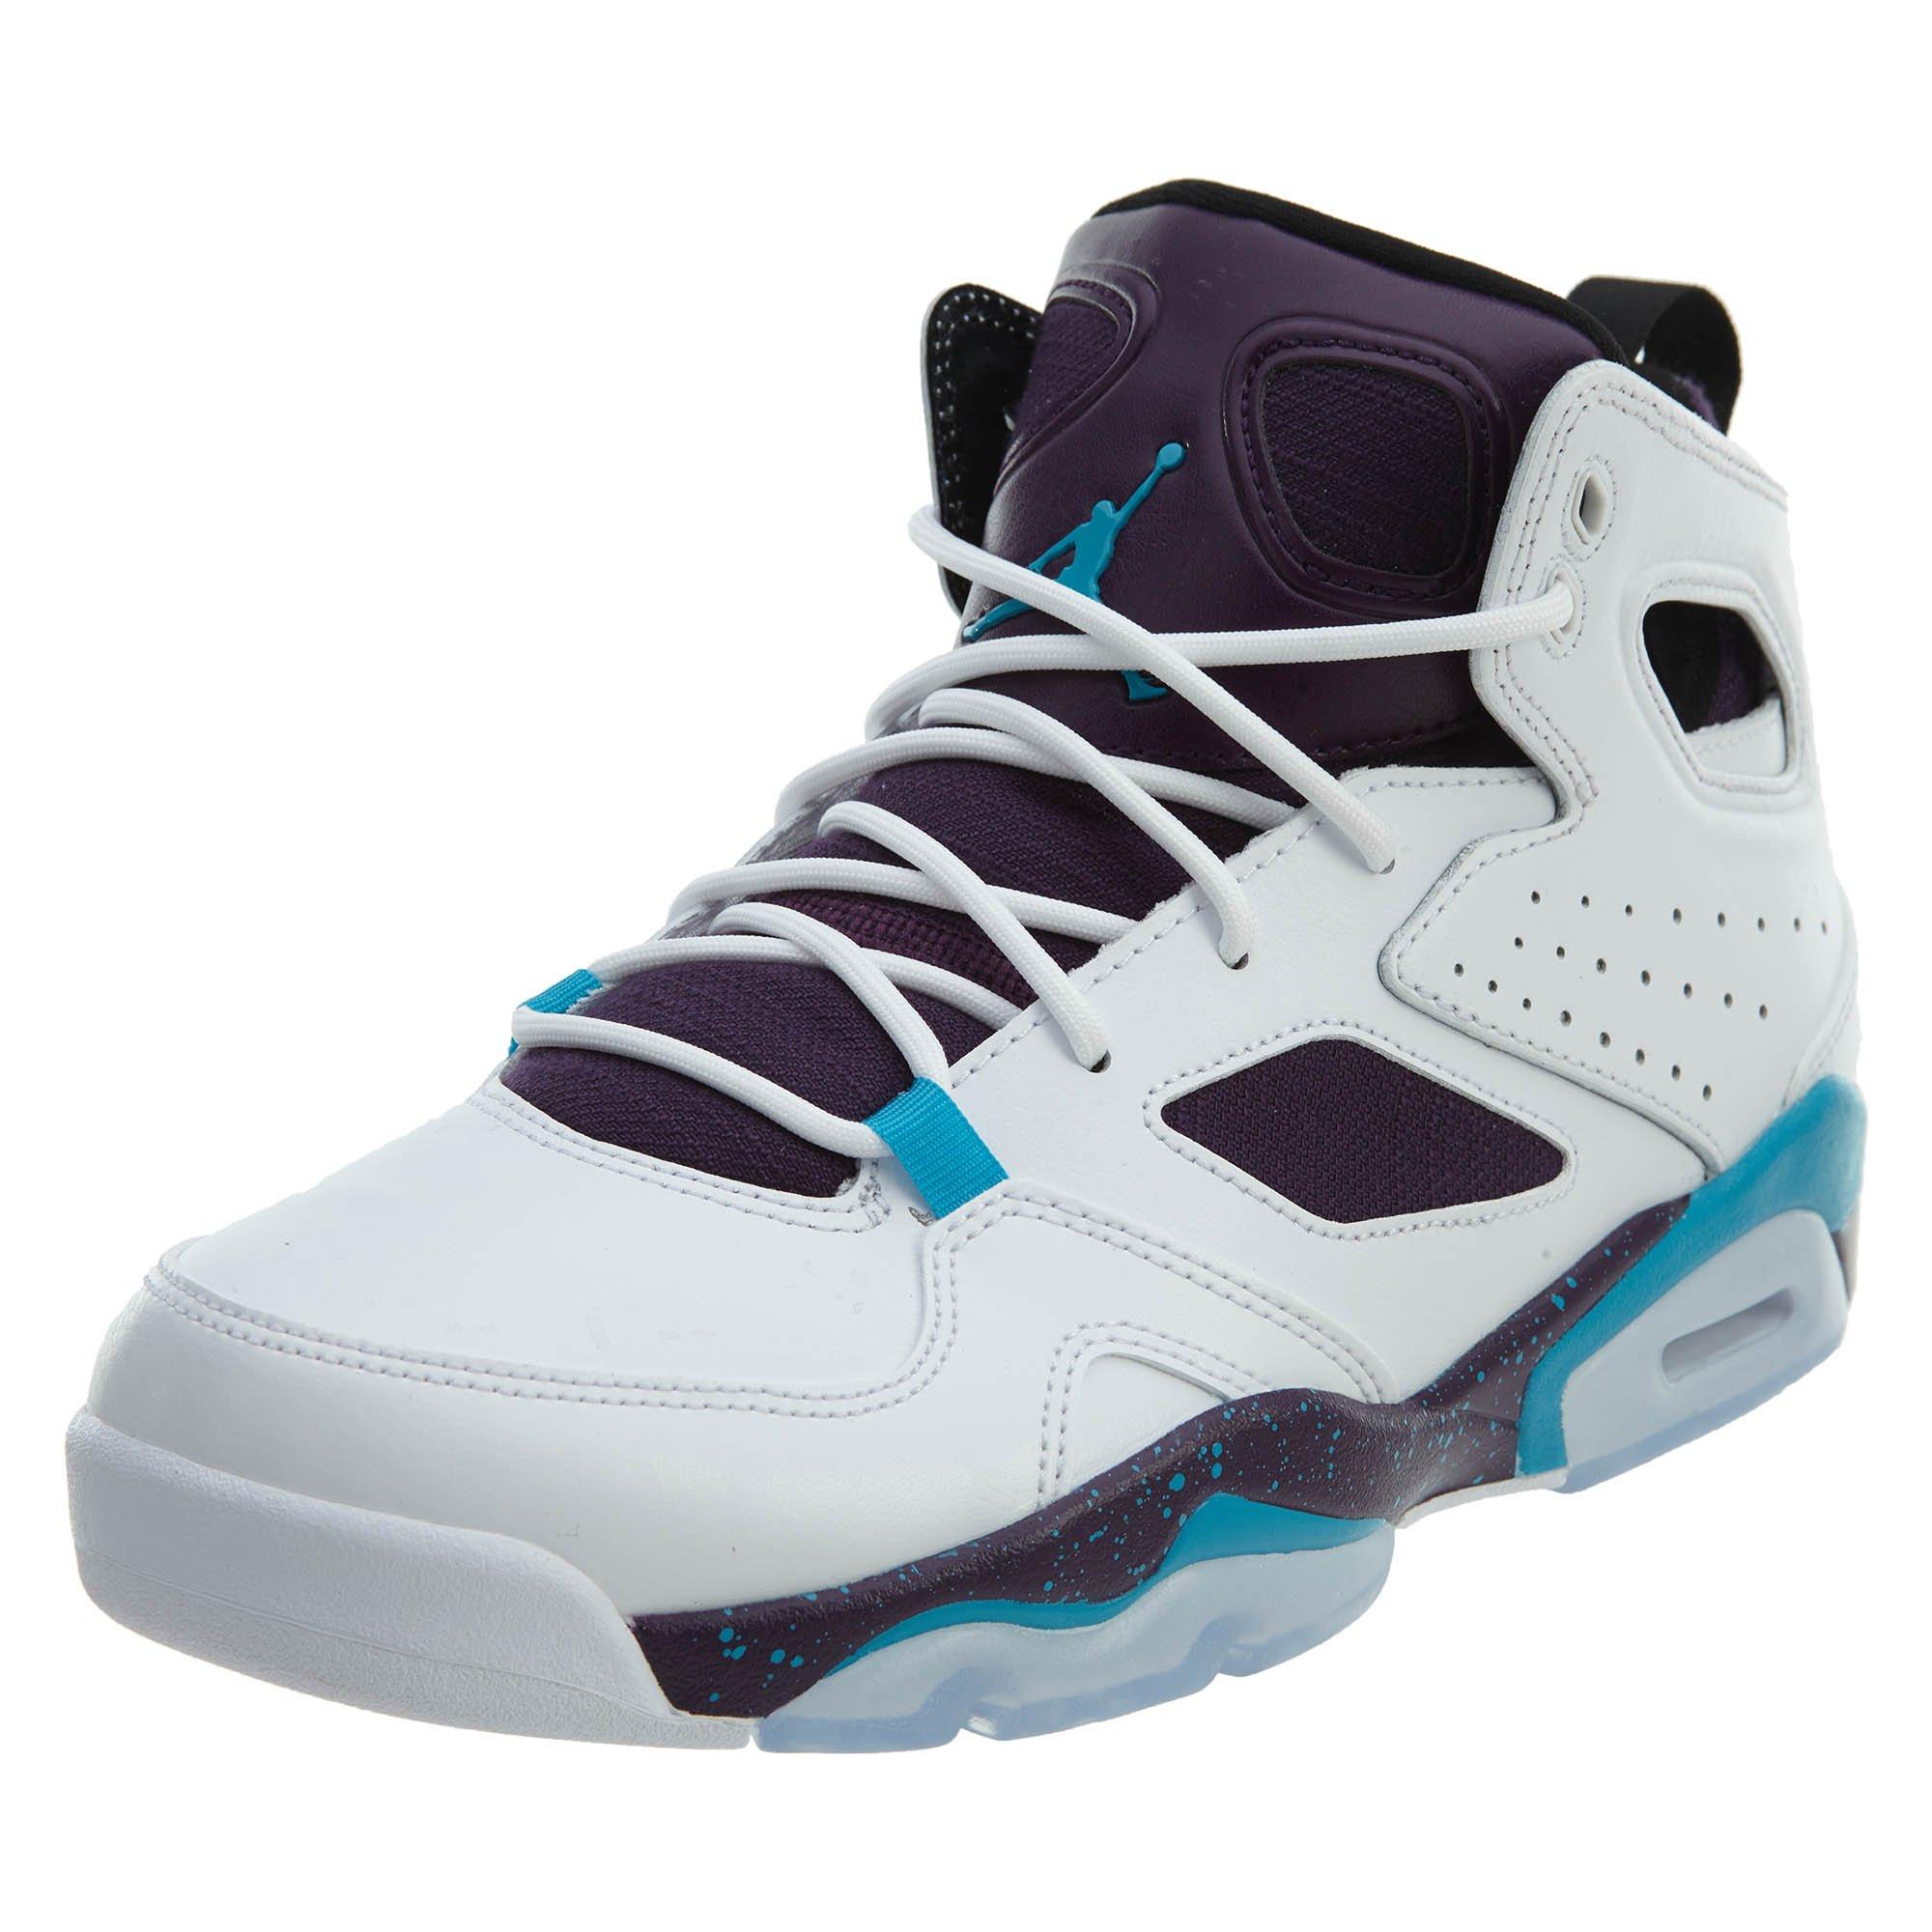 7ce06b1da2c0 Galleon - Jordan Mens Flight Club 91 White Blue Lagoon Purple Black Size  12.5